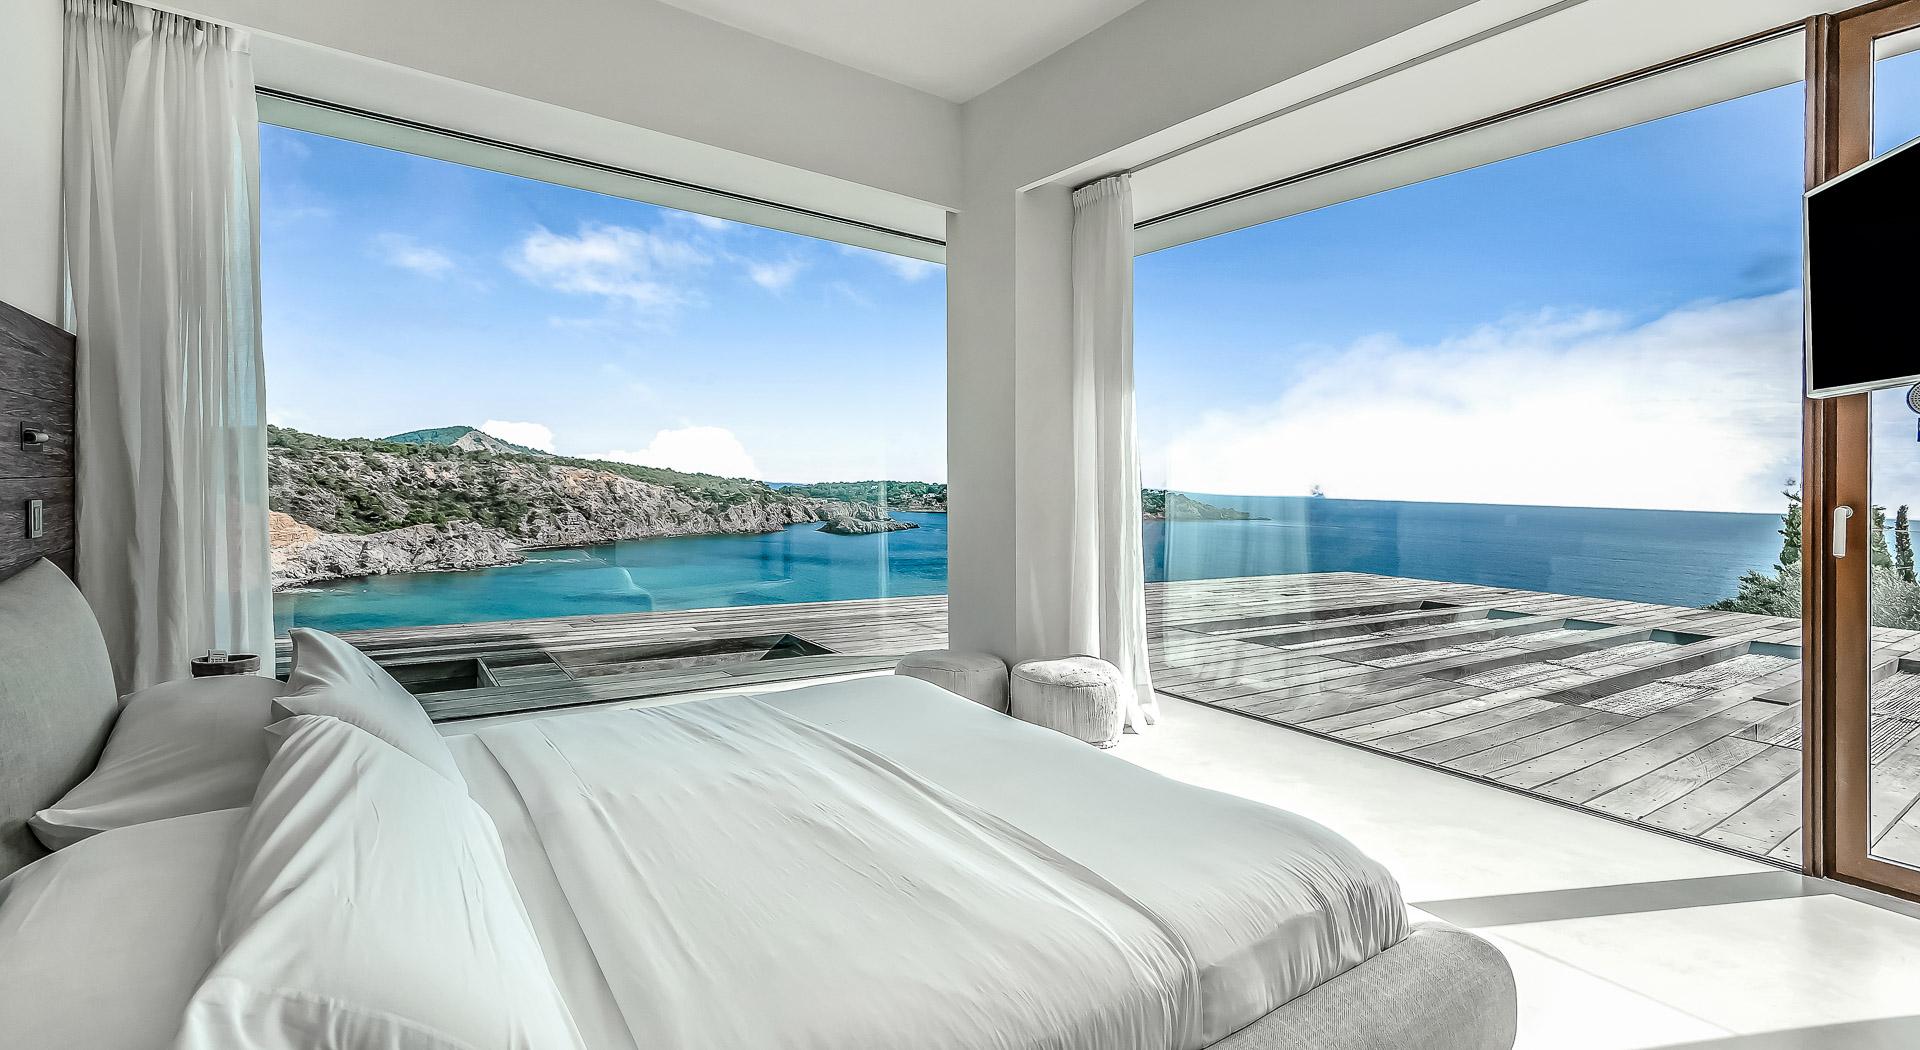 The best Villa in Ibiza